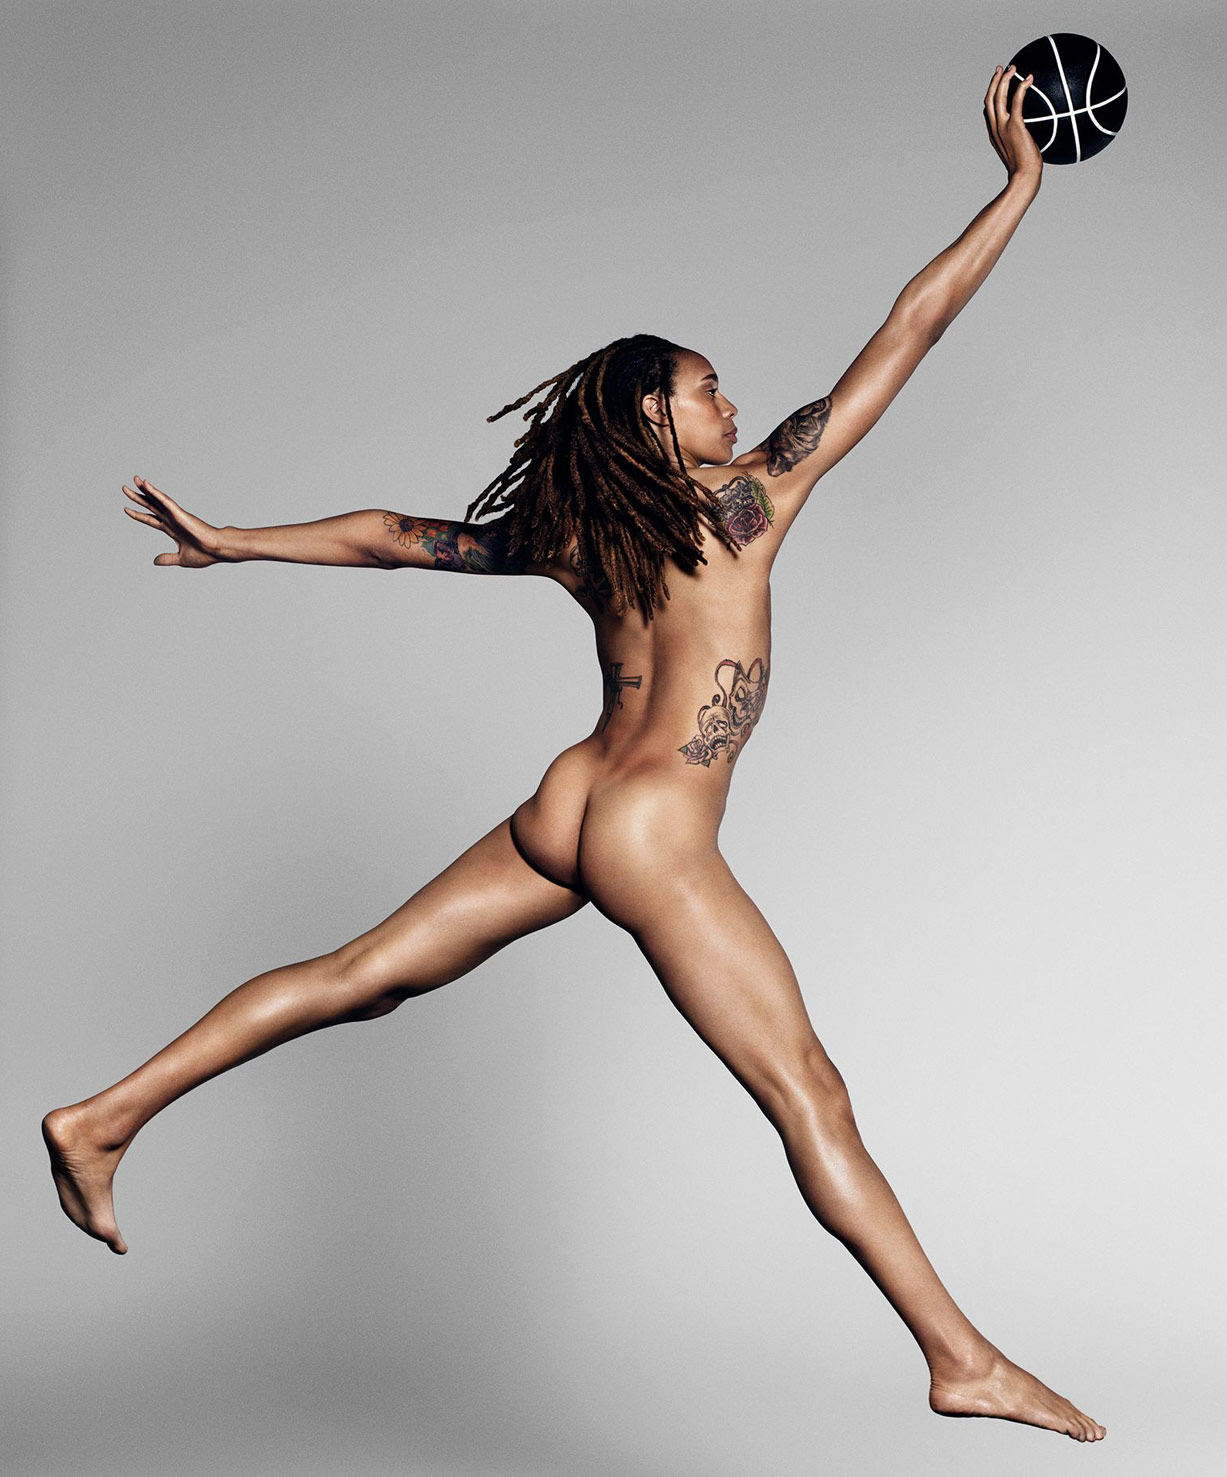 ESPN Magazine The Body Issue 2015 - Brittney Griner / Бриттни Грайнер - Культ тела журнала ESPN